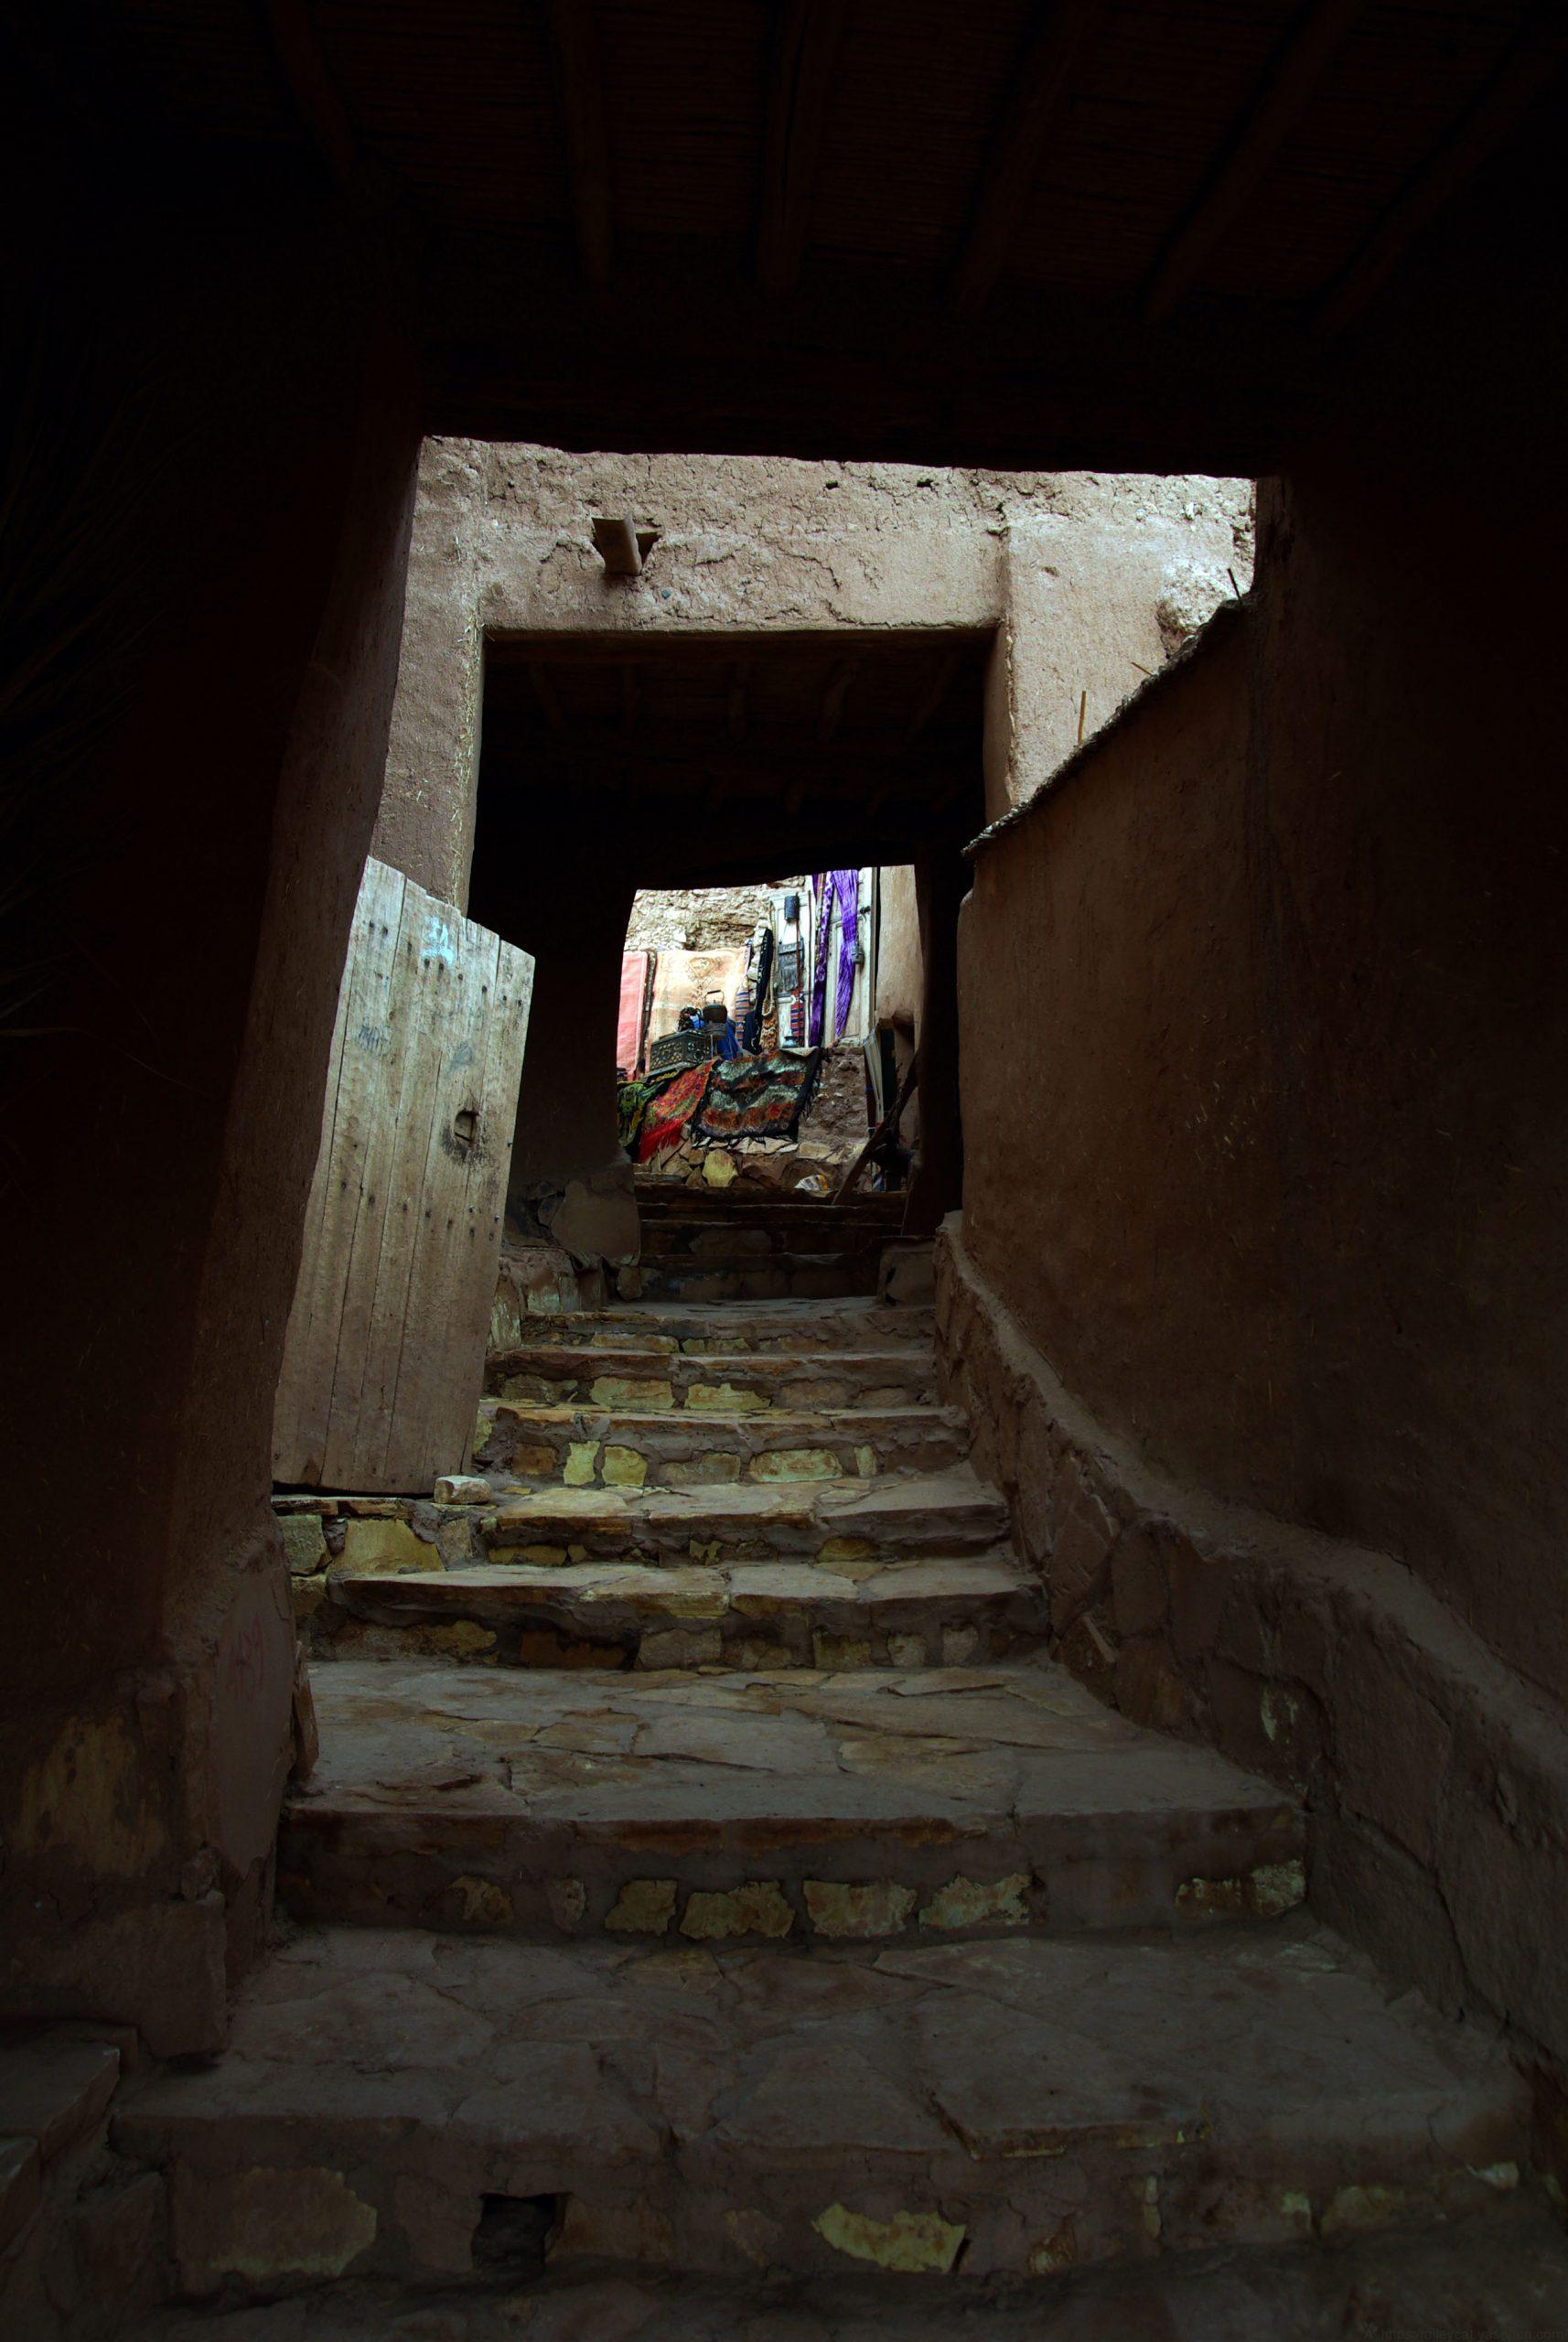 Ait Benhaddou, Morocco, 2008